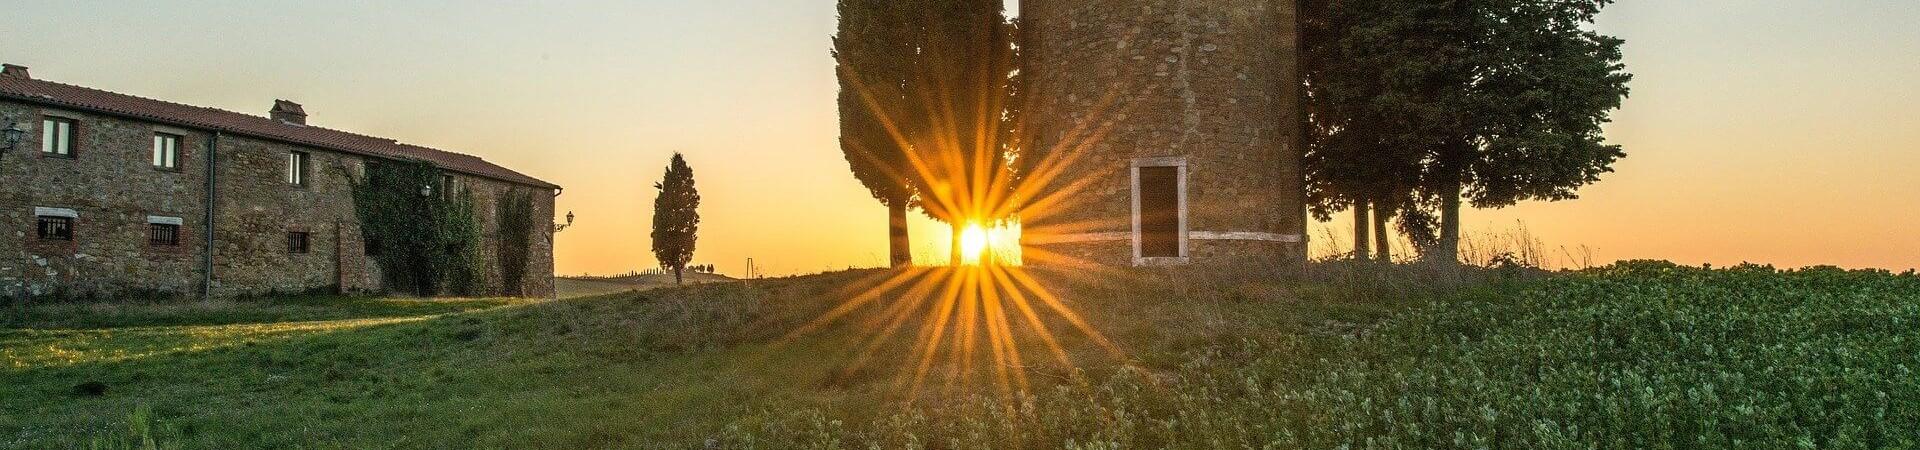 architektura Toskania